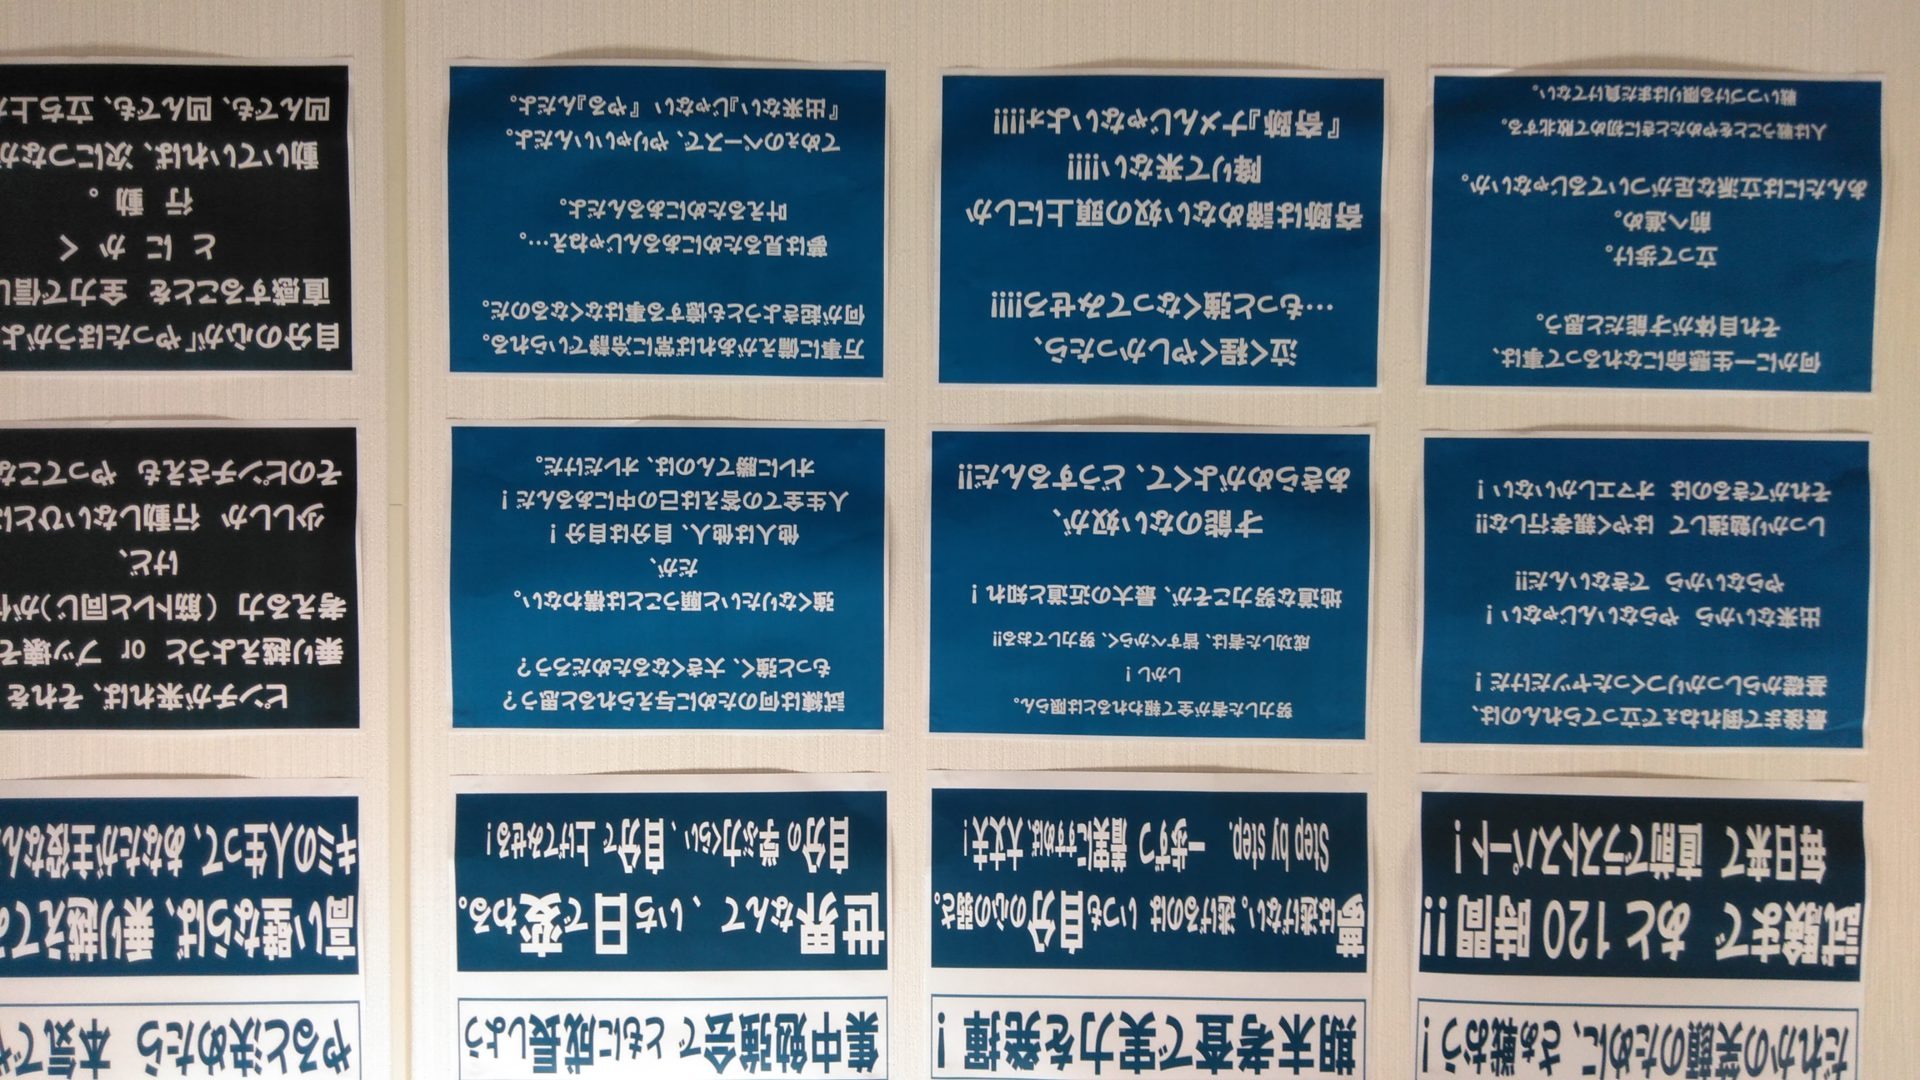 KIMG0005錦ケ丘校・期末考査ヤル気アップ